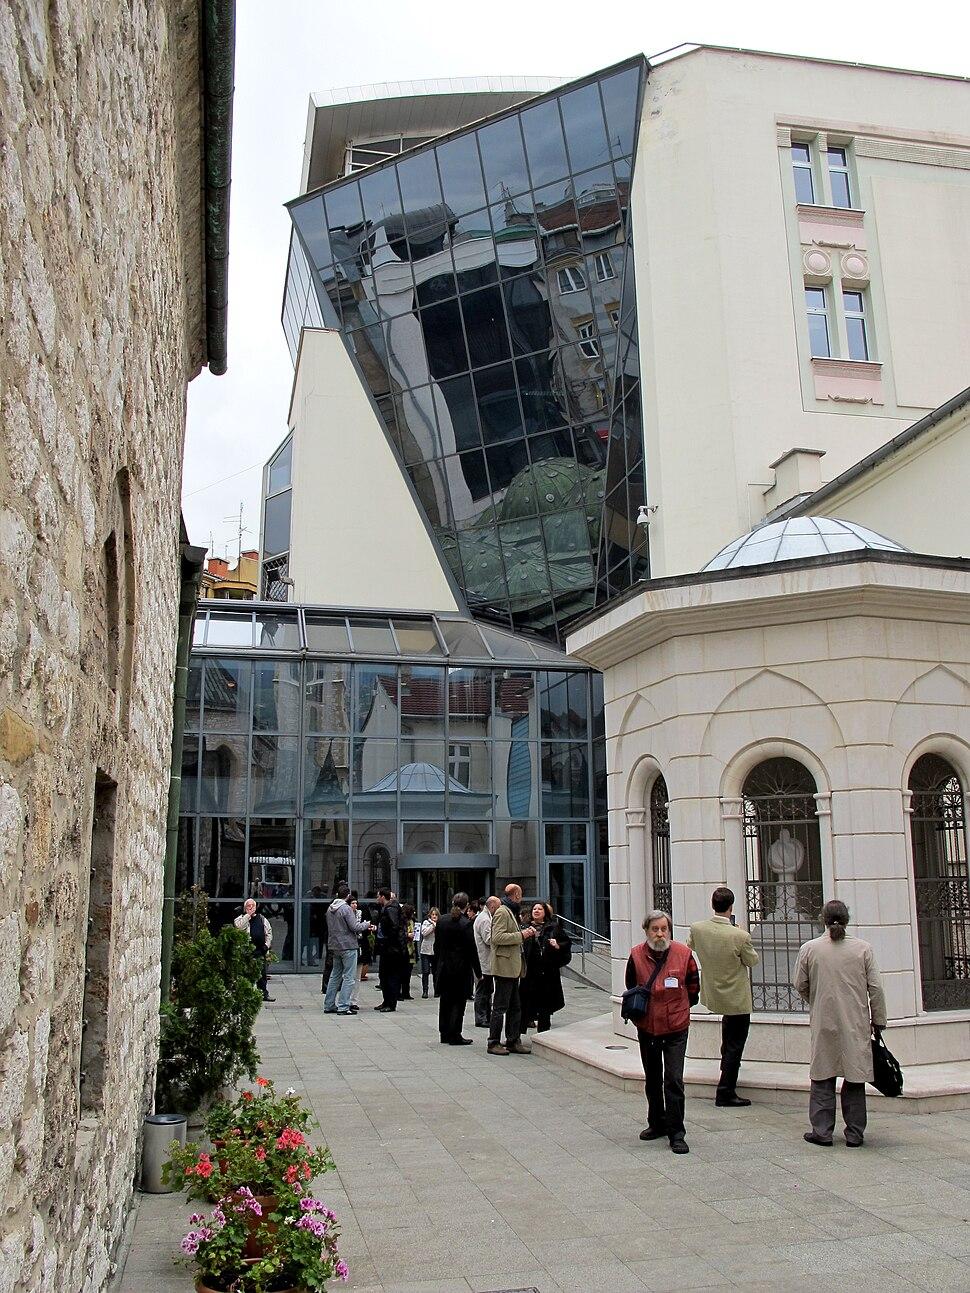 The Bosniak institute located in Sarajevo